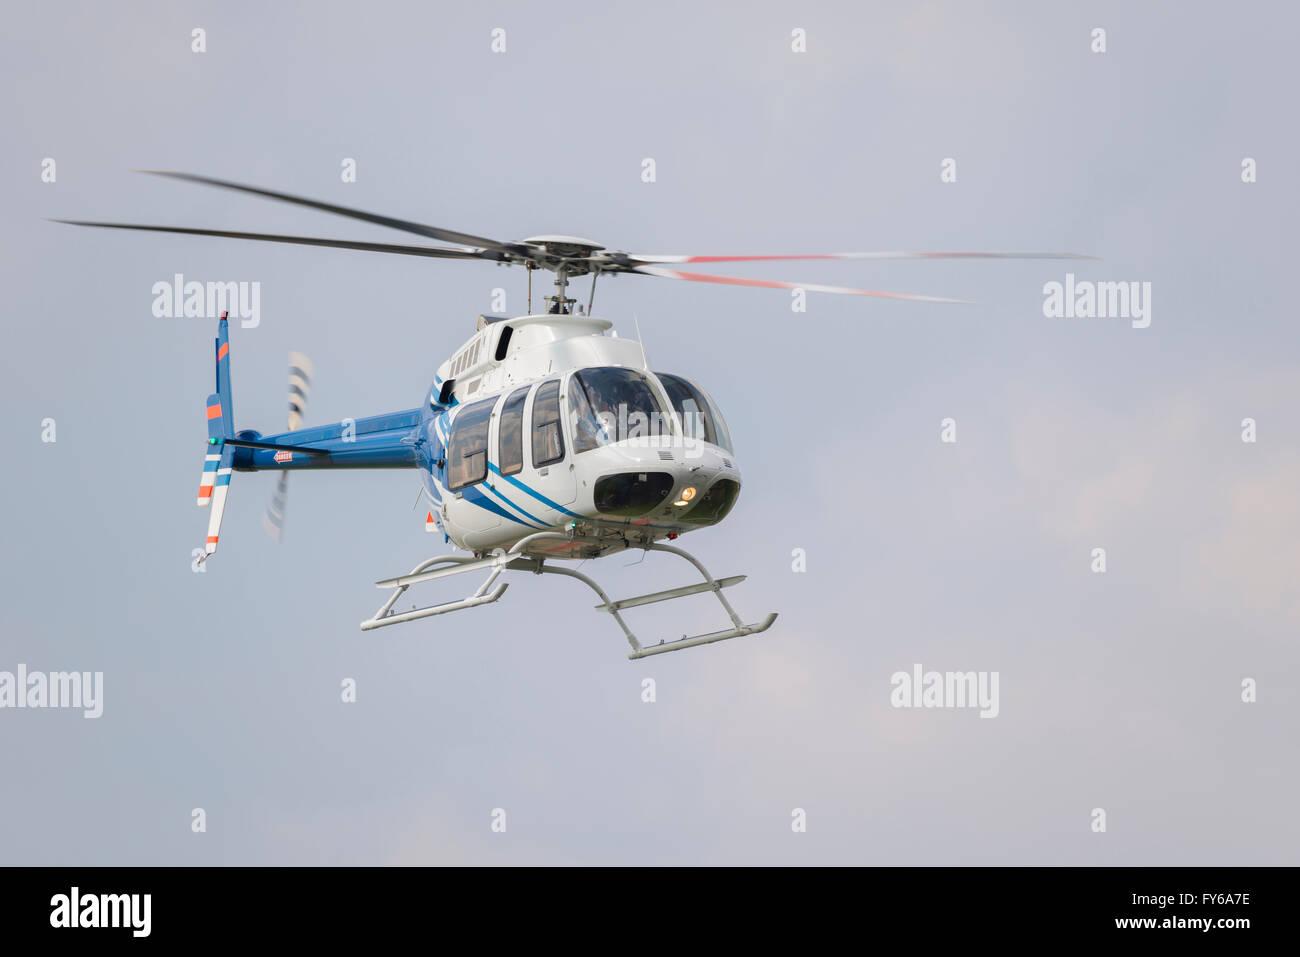 Hubschrauber im Flug direkt nach dem Start Stockbild